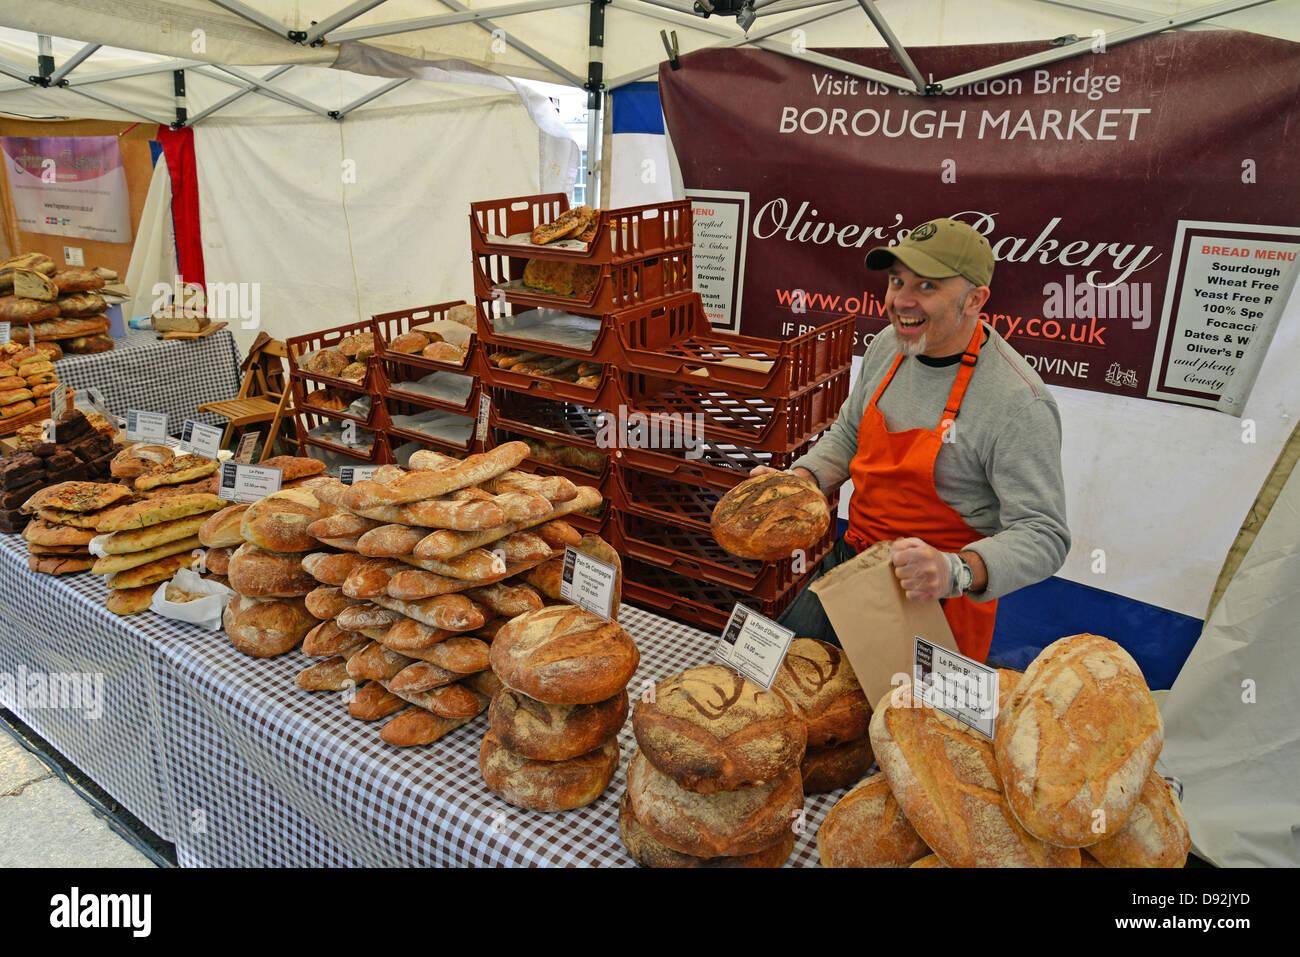 Bread selection on bakery stall at Farmer's Market, Bishop's Stortford, Hertfordshire, England, United Kingdom Stock Photo